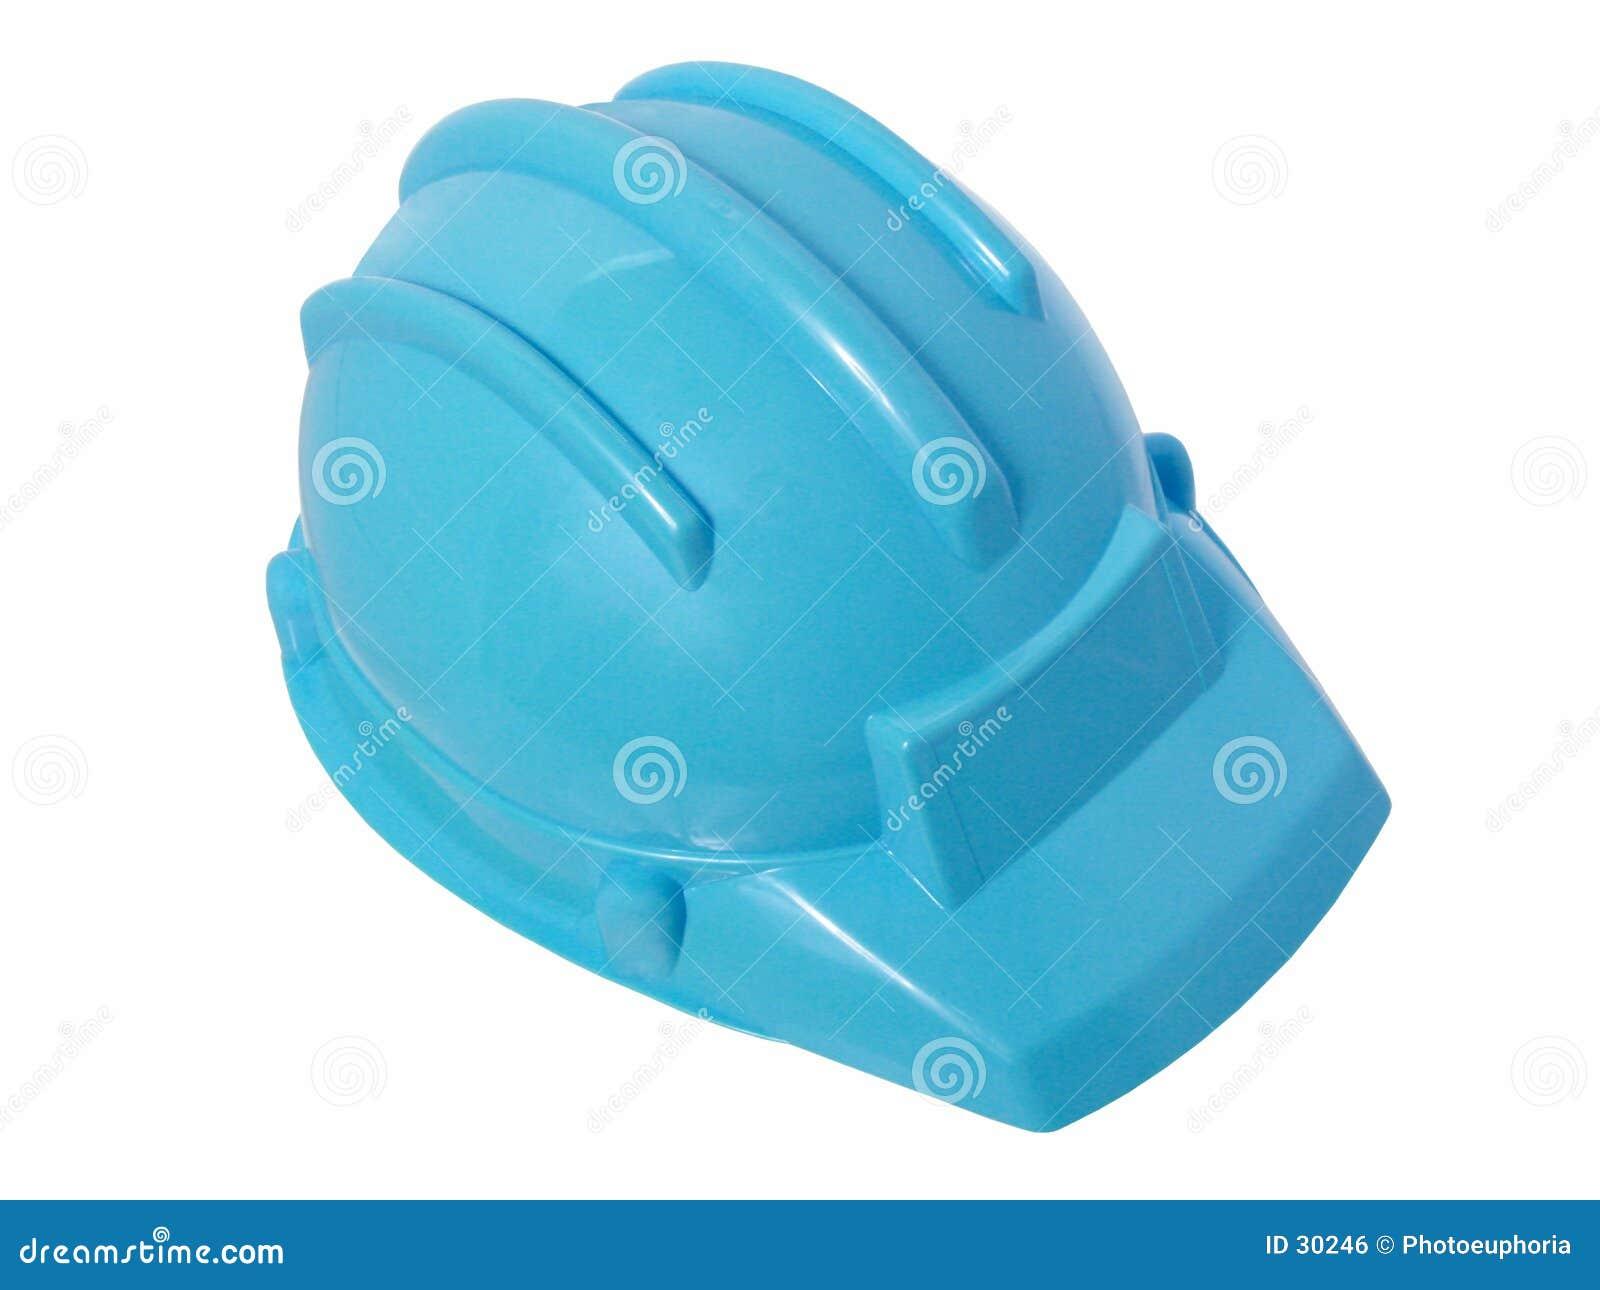 Toys: Bright Blue Plastic Construction Helmet